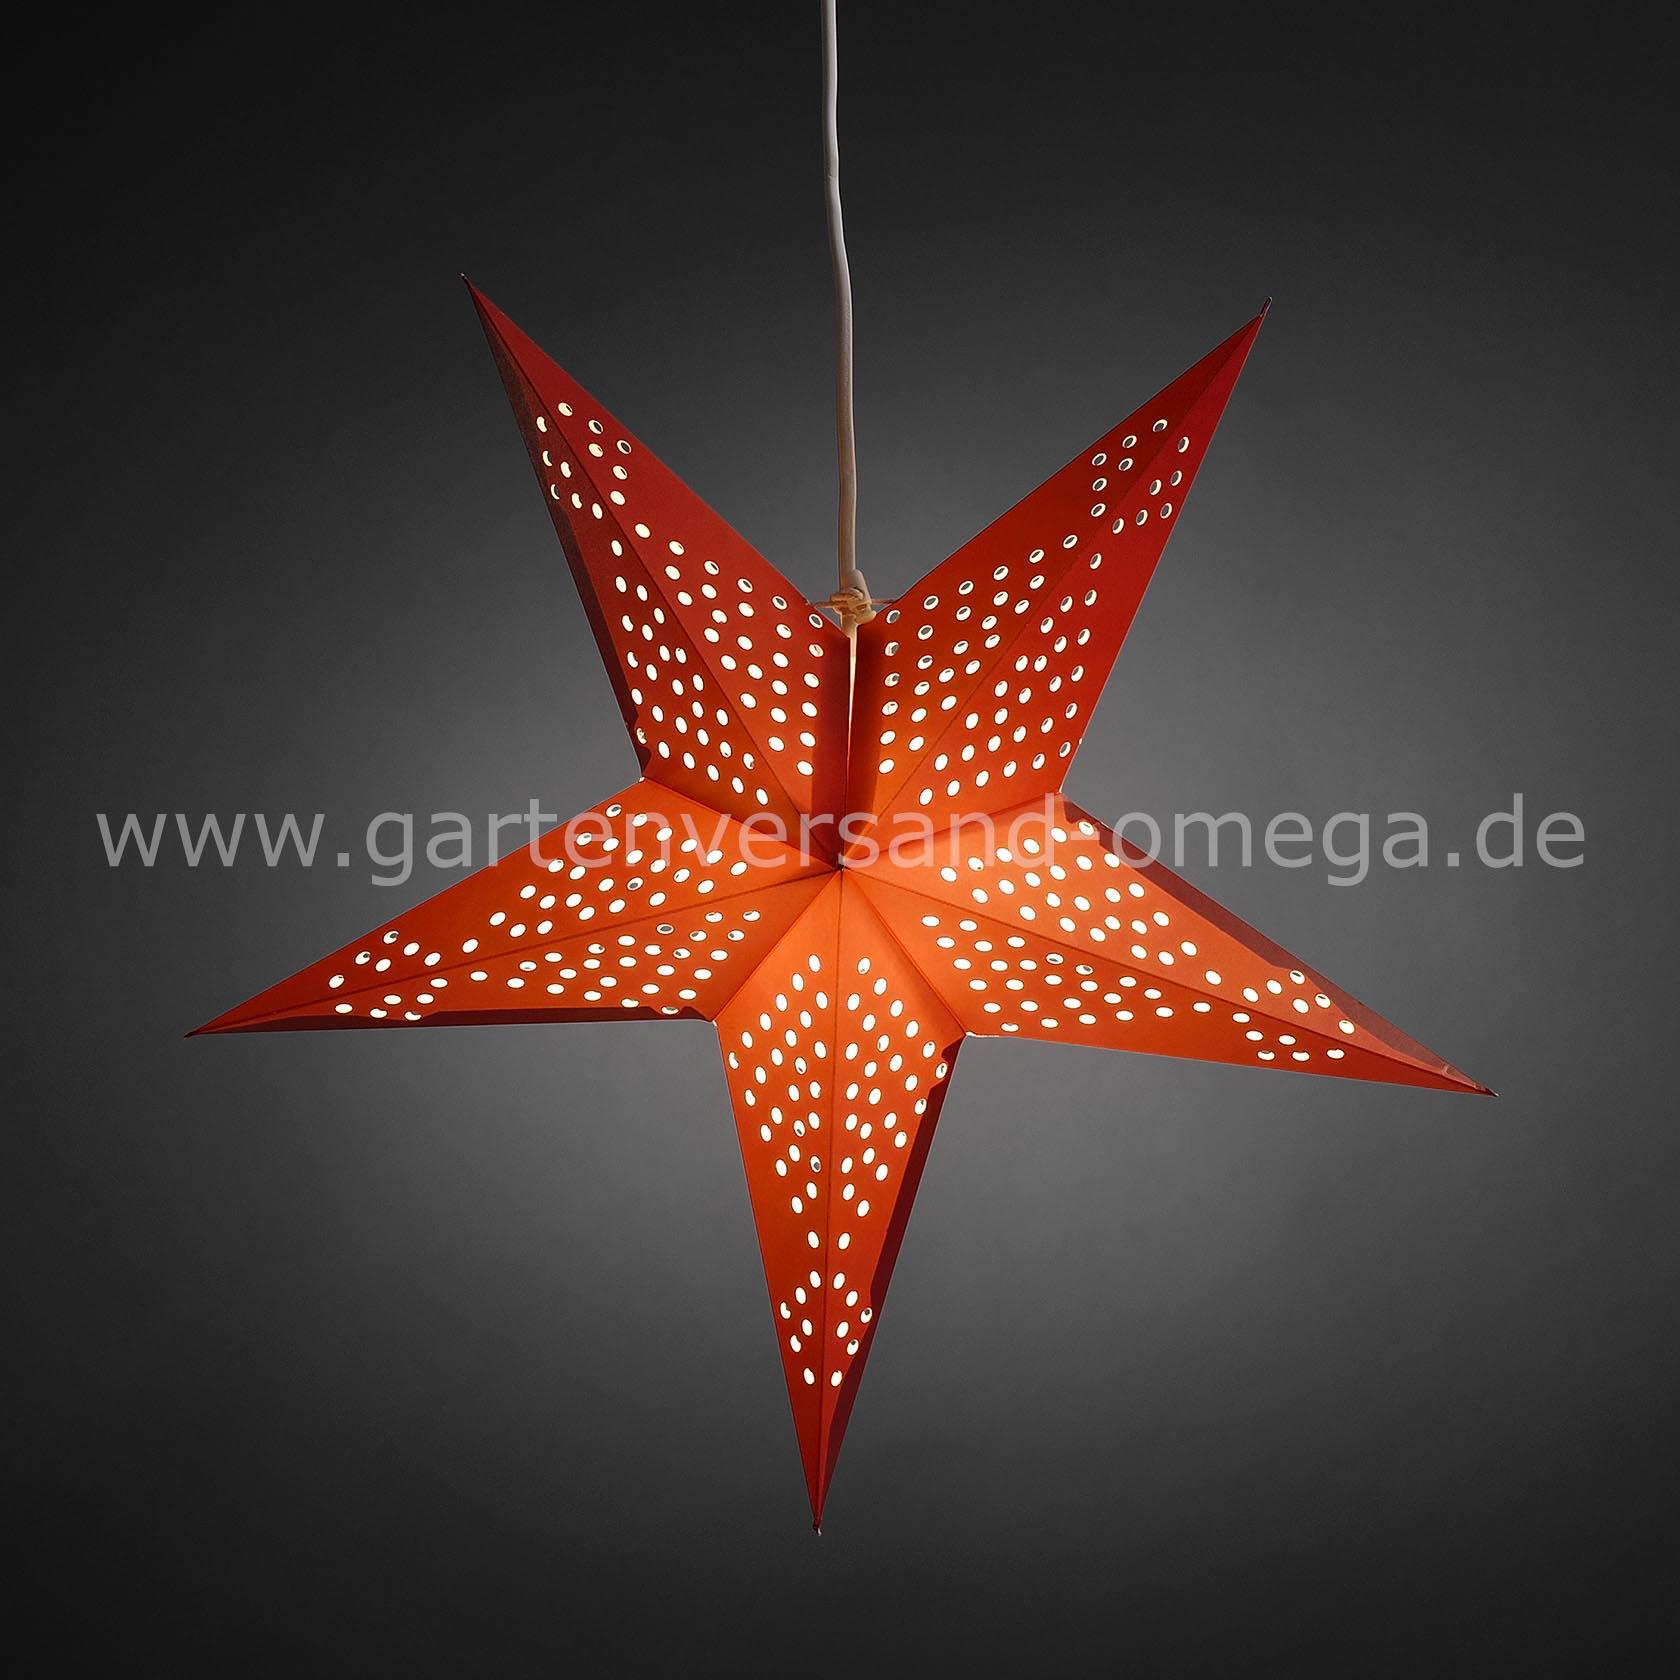 beleuchteter papierstern rot deko weihnachtsstern adventsstern beleuchtet leuchtender stern. Black Bedroom Furniture Sets. Home Design Ideas